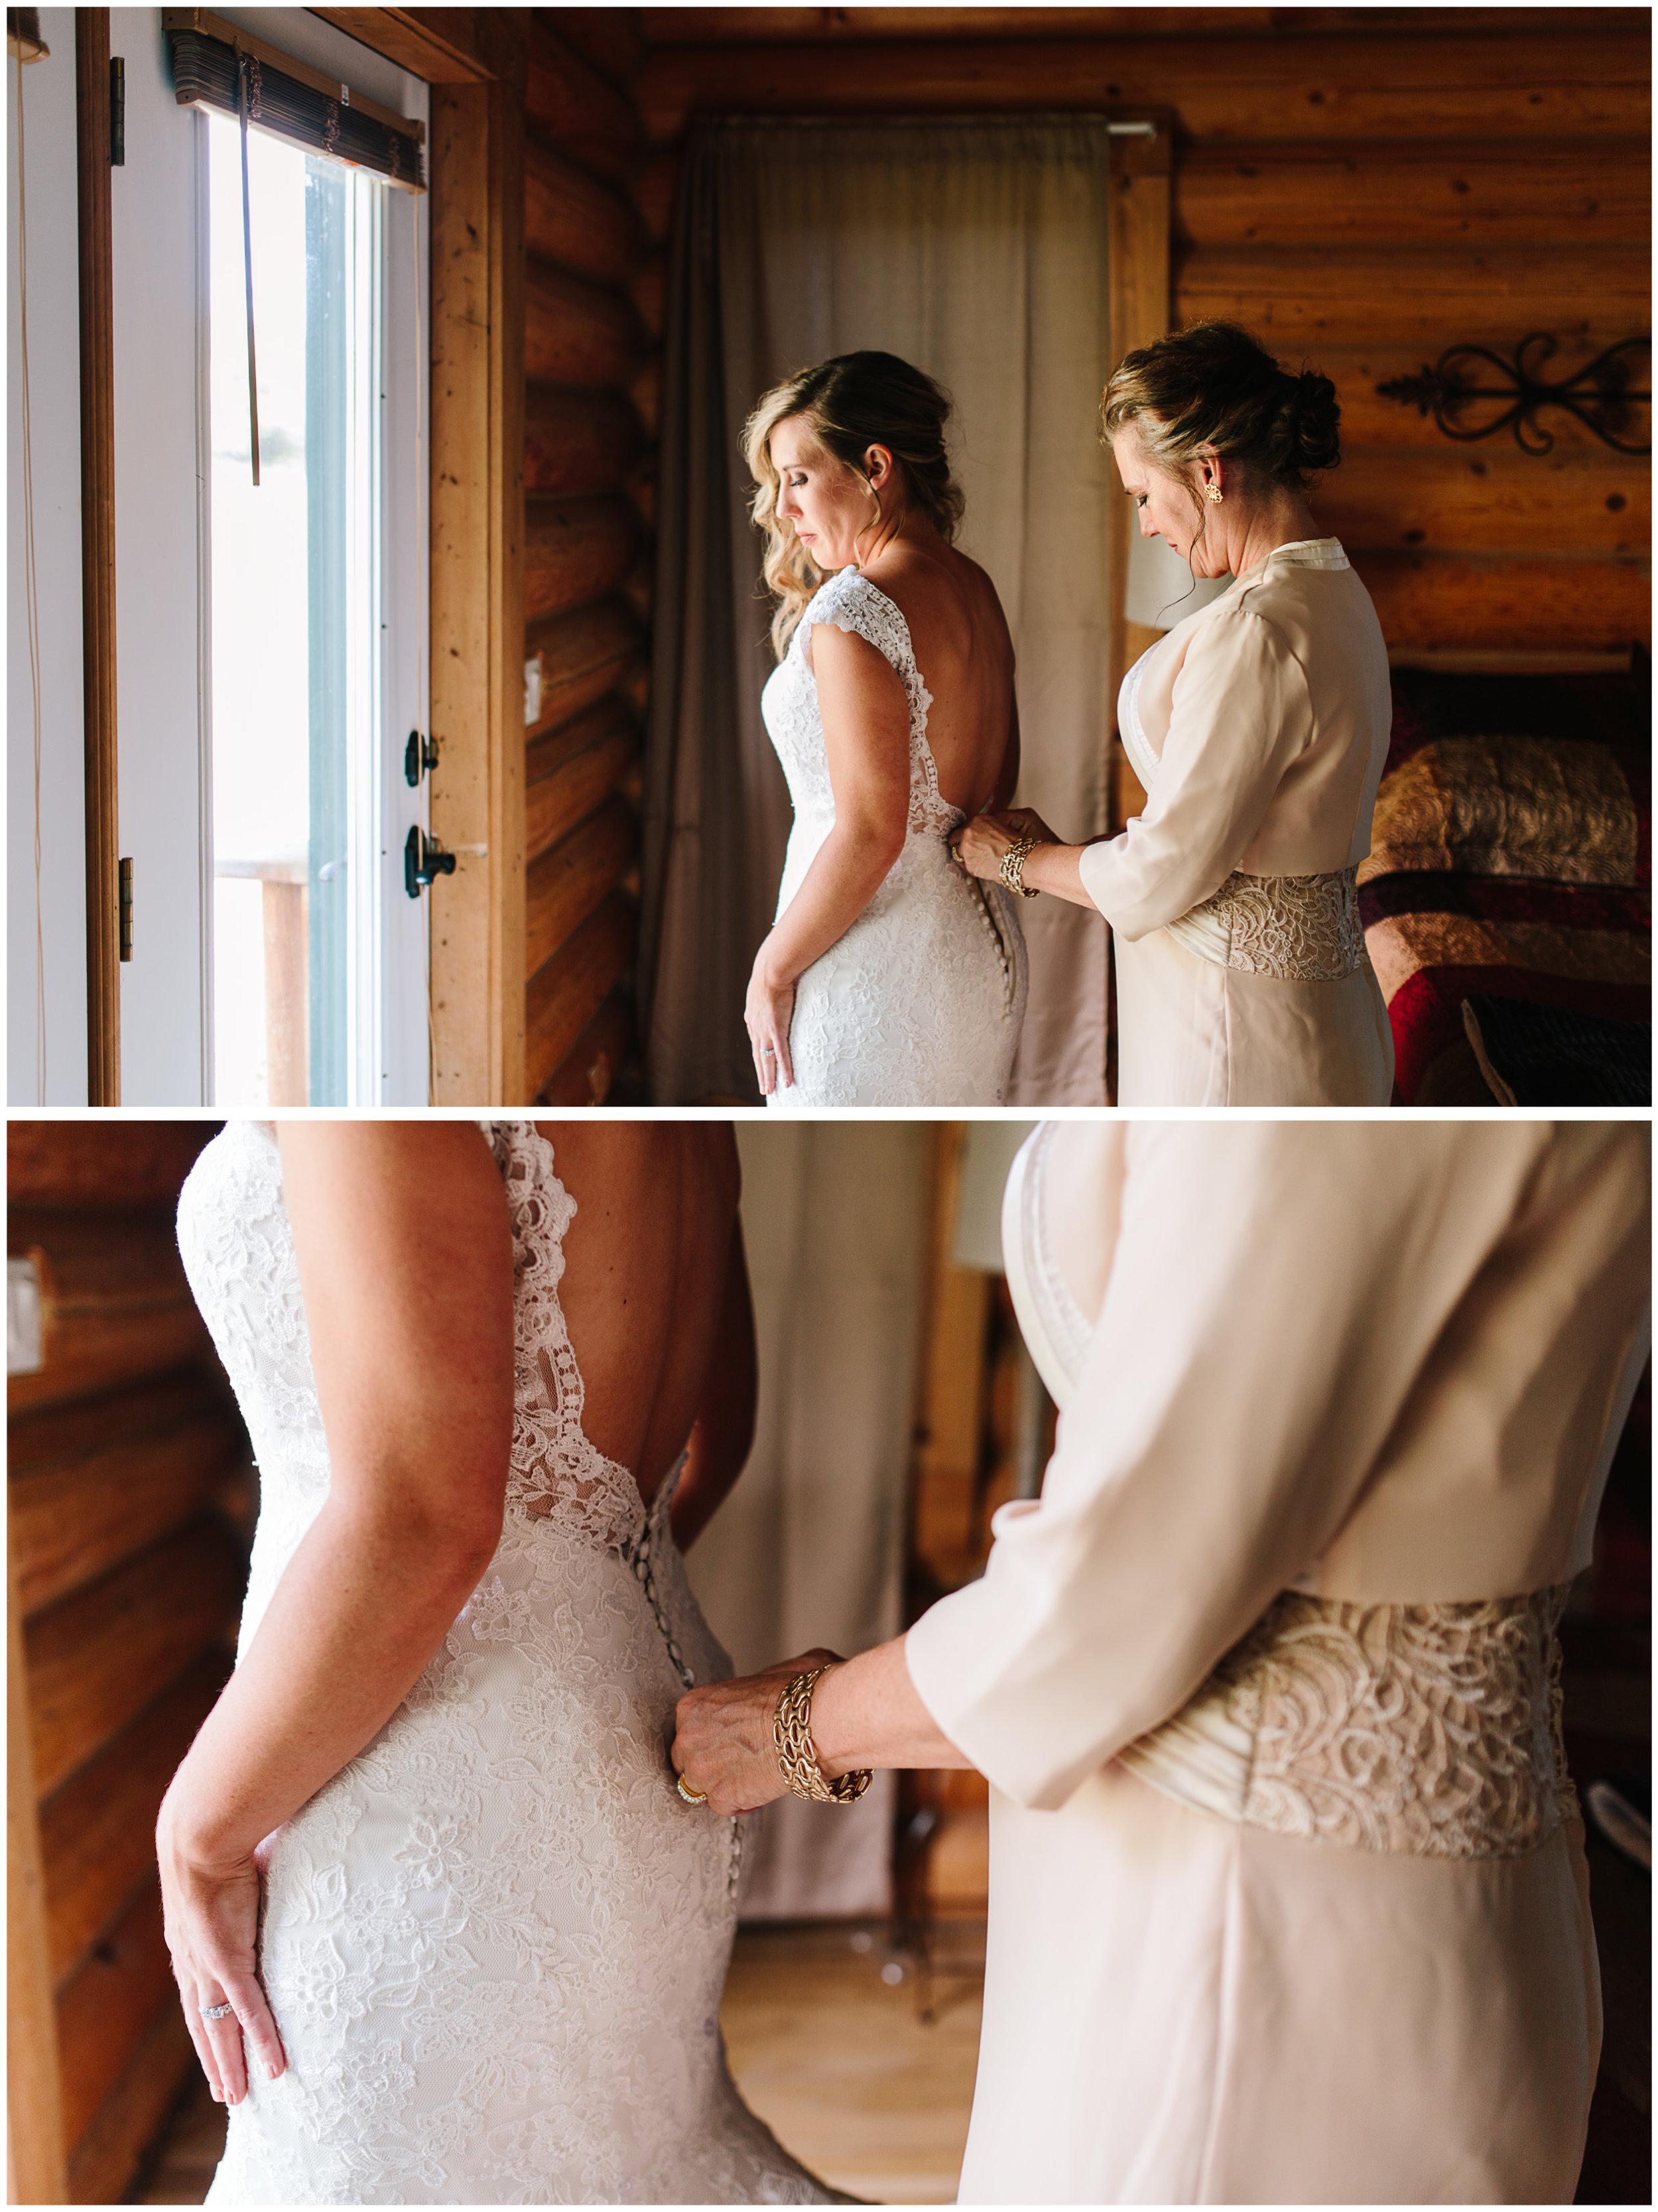 redlodge_montana_wedding_10.jpg